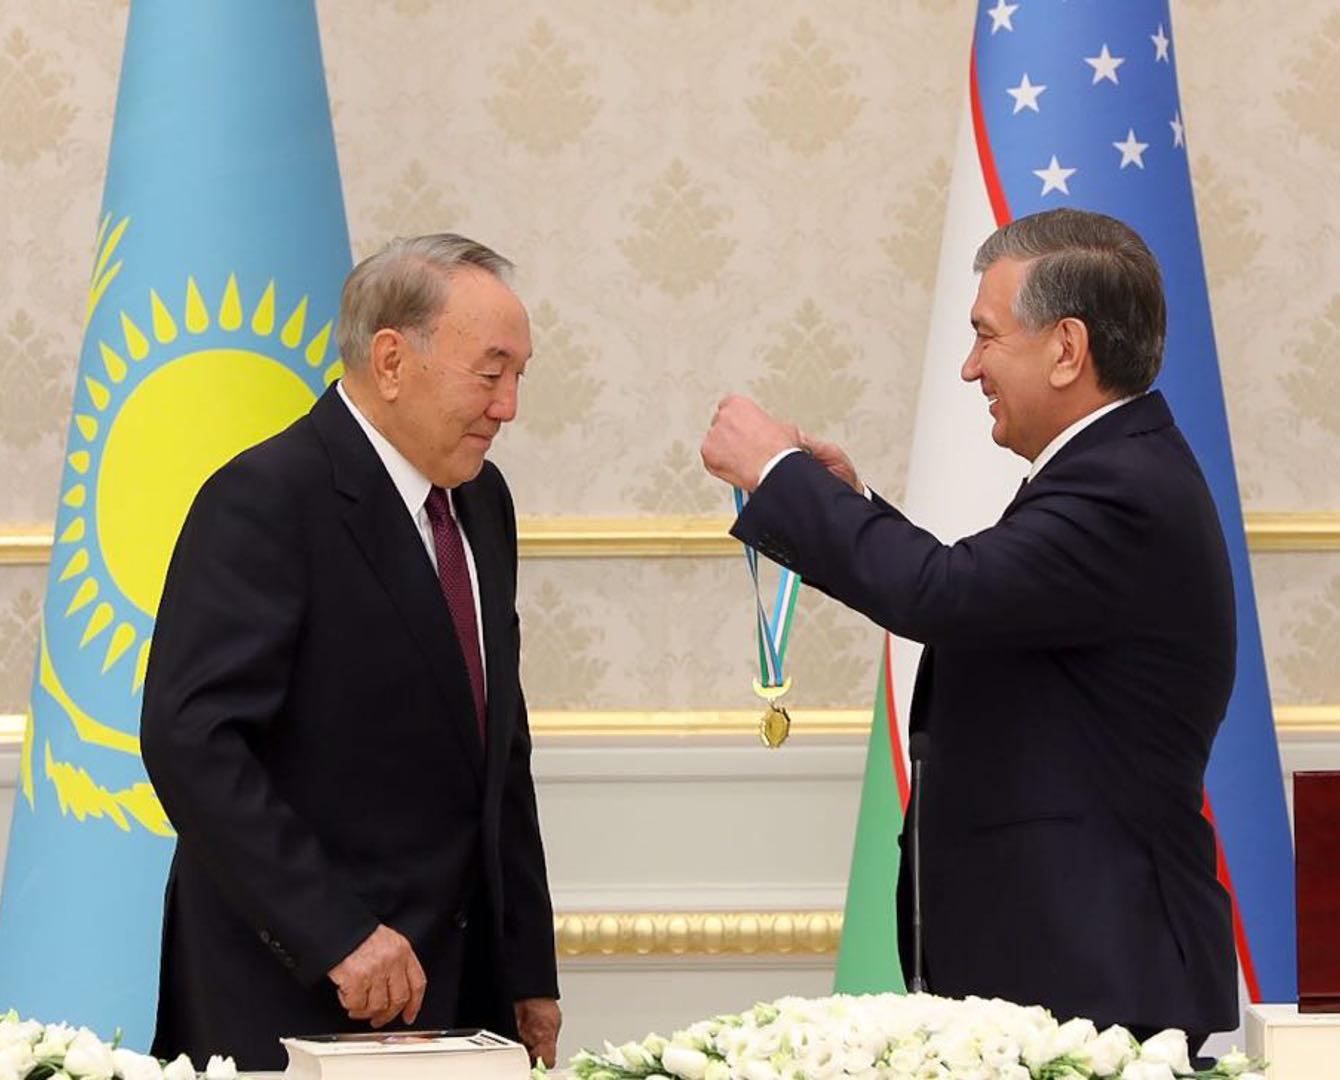 Нурсултана Назарбаева наградили узбекским орденом «Эл-юрт Хурмати»